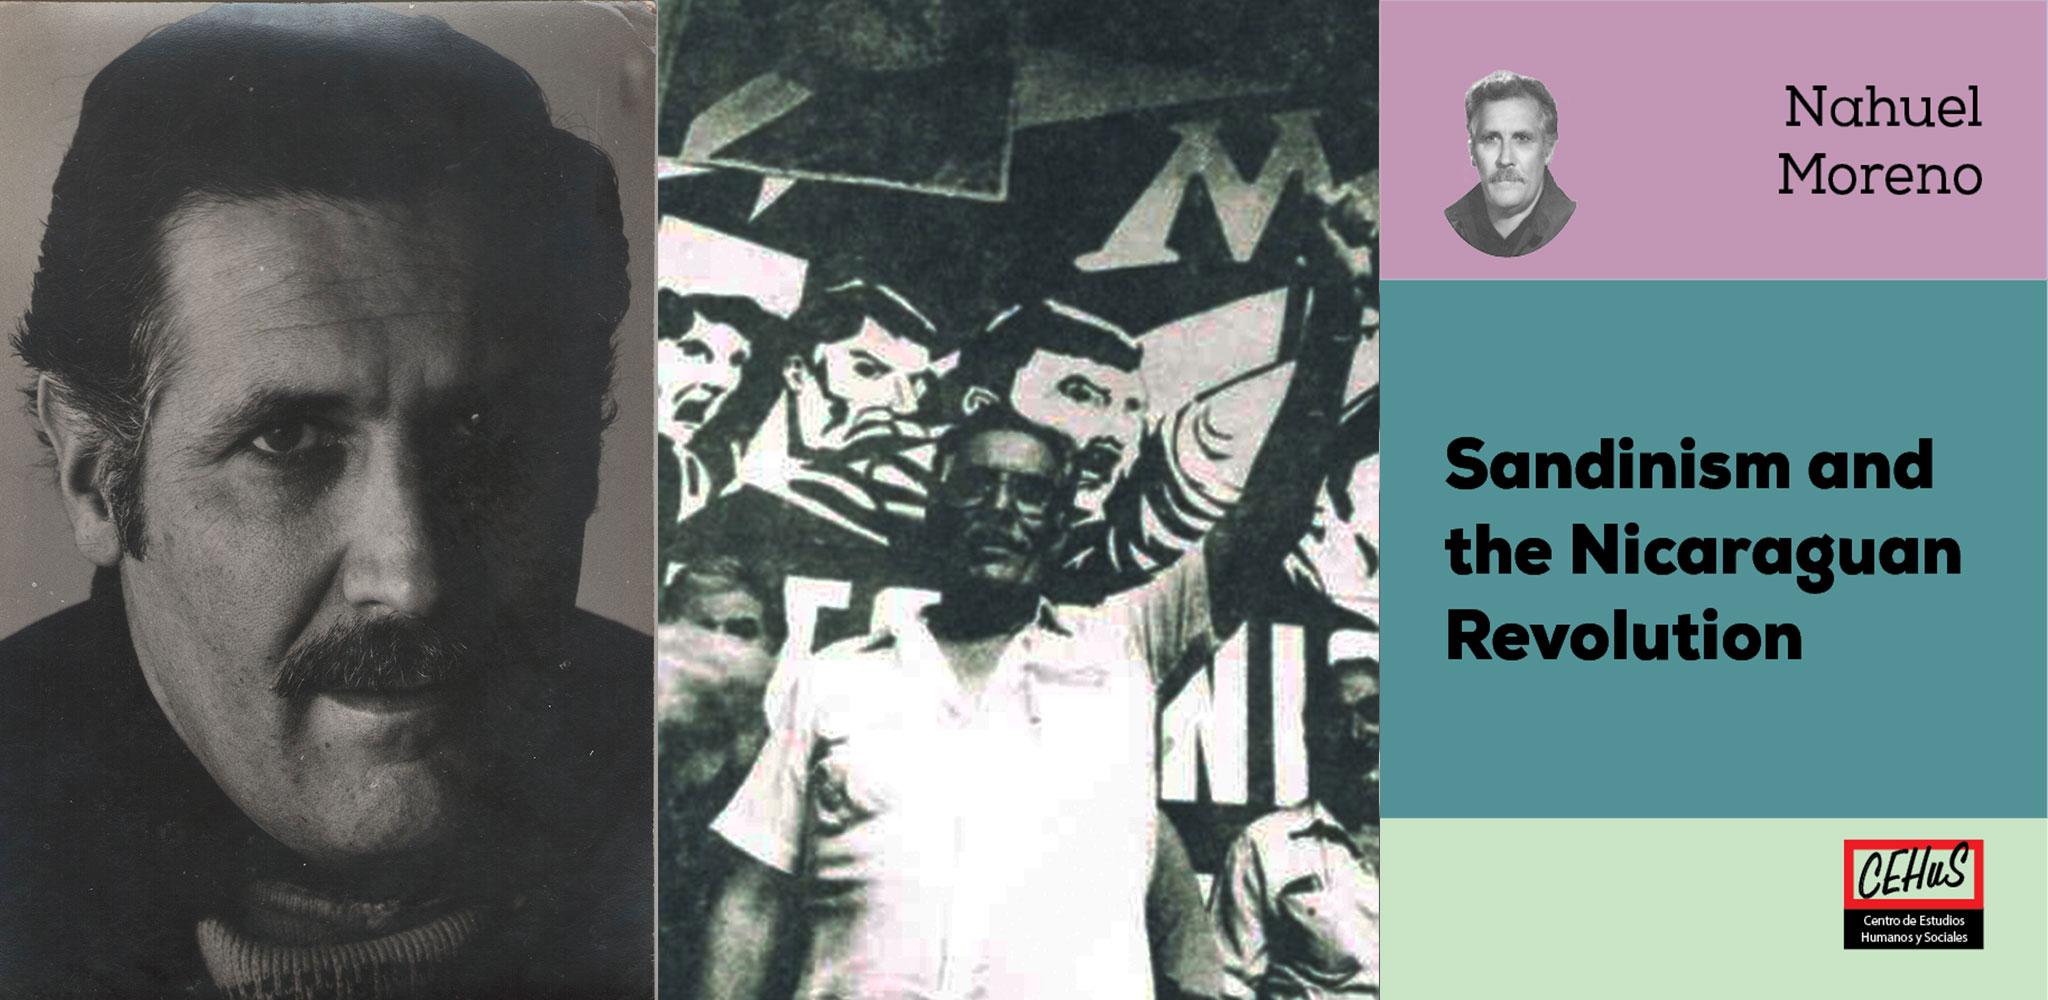 SANDINISM AND THE NICARAGUAN REVOLUTION (1986)